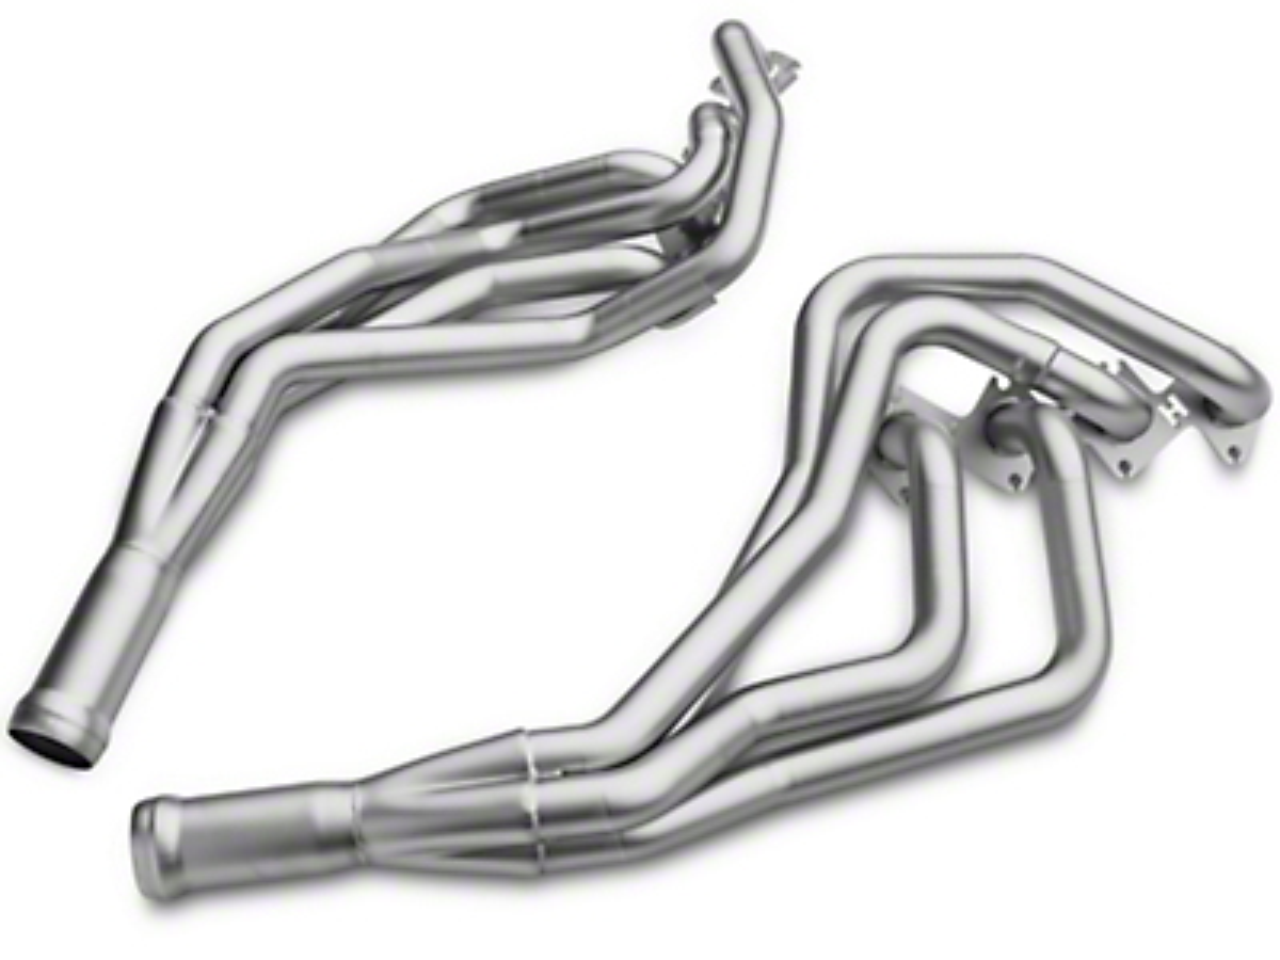 LTH 1-3/4 in. Long Tube Headers (05-10 GT)